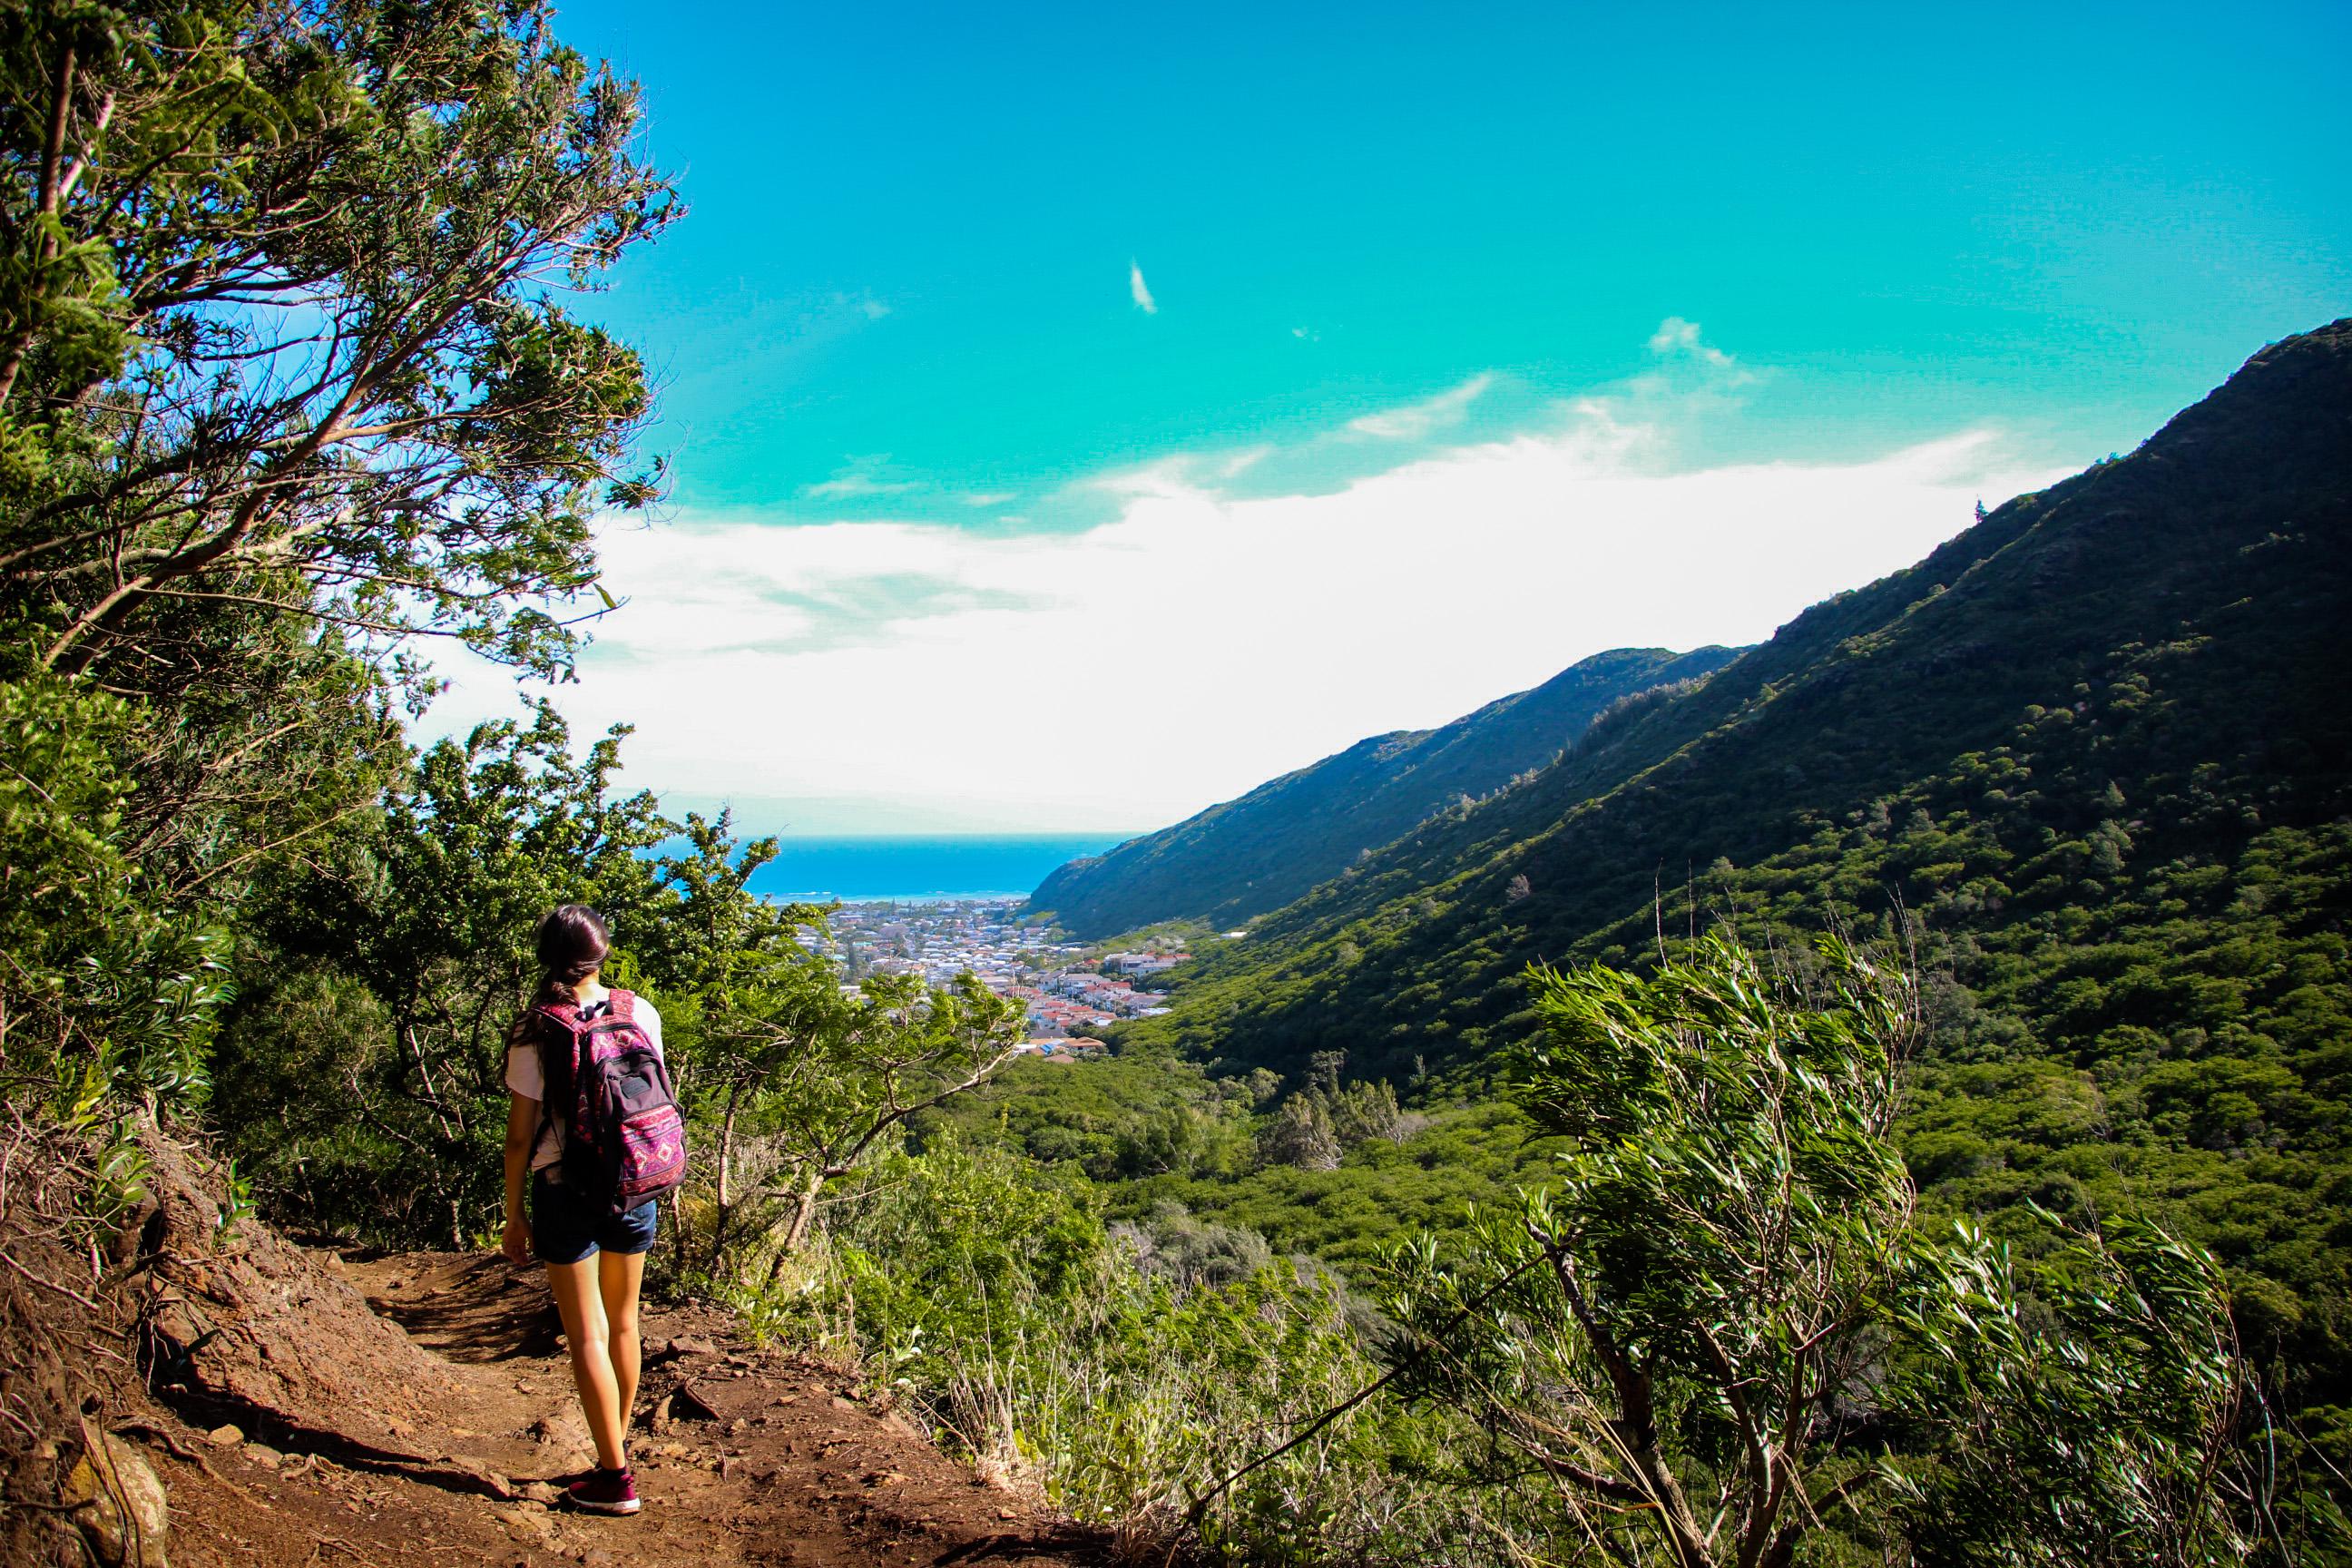 TRILHAS EM OAHU, Kuliouou Ridge Trail